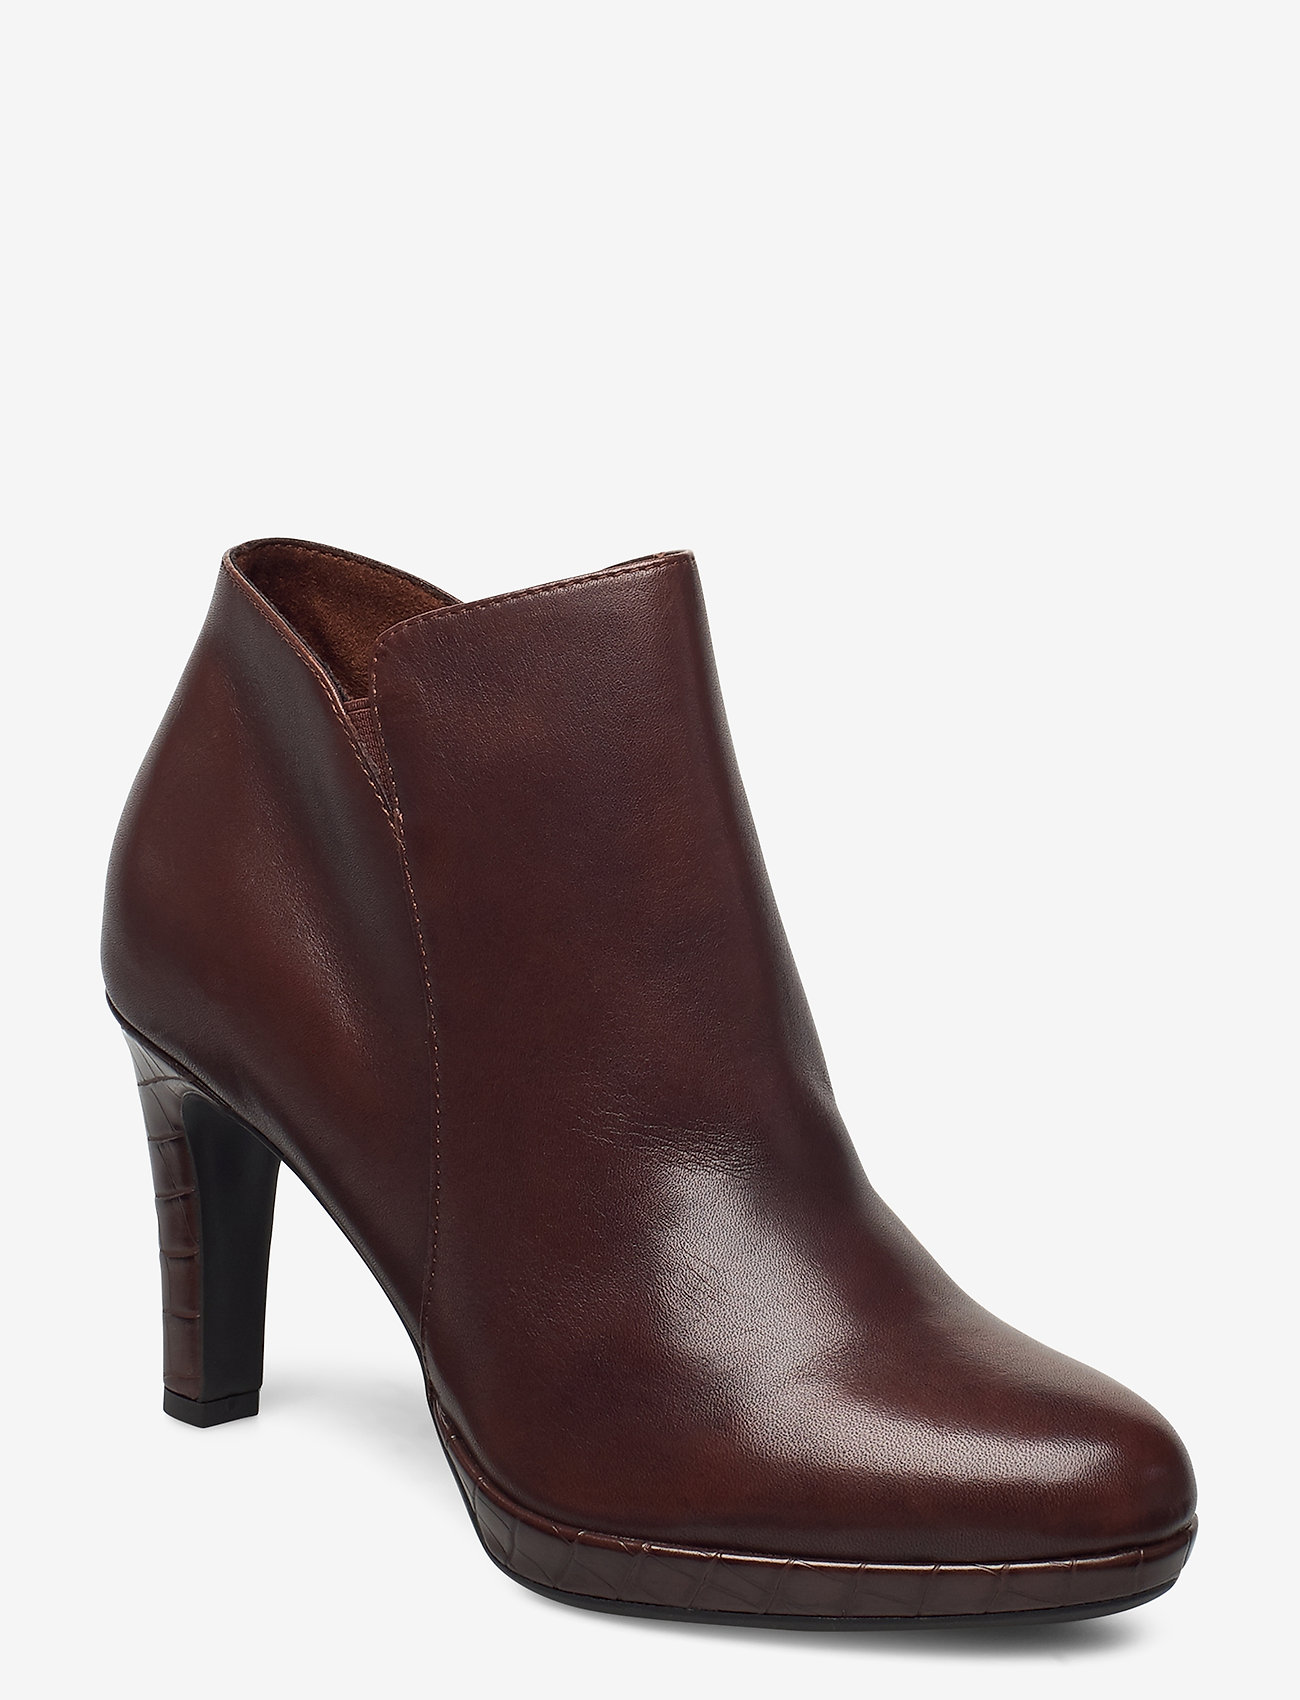 Tamaris - Woms Boots - enkellaarsjes met hak - maroon/croco - 0